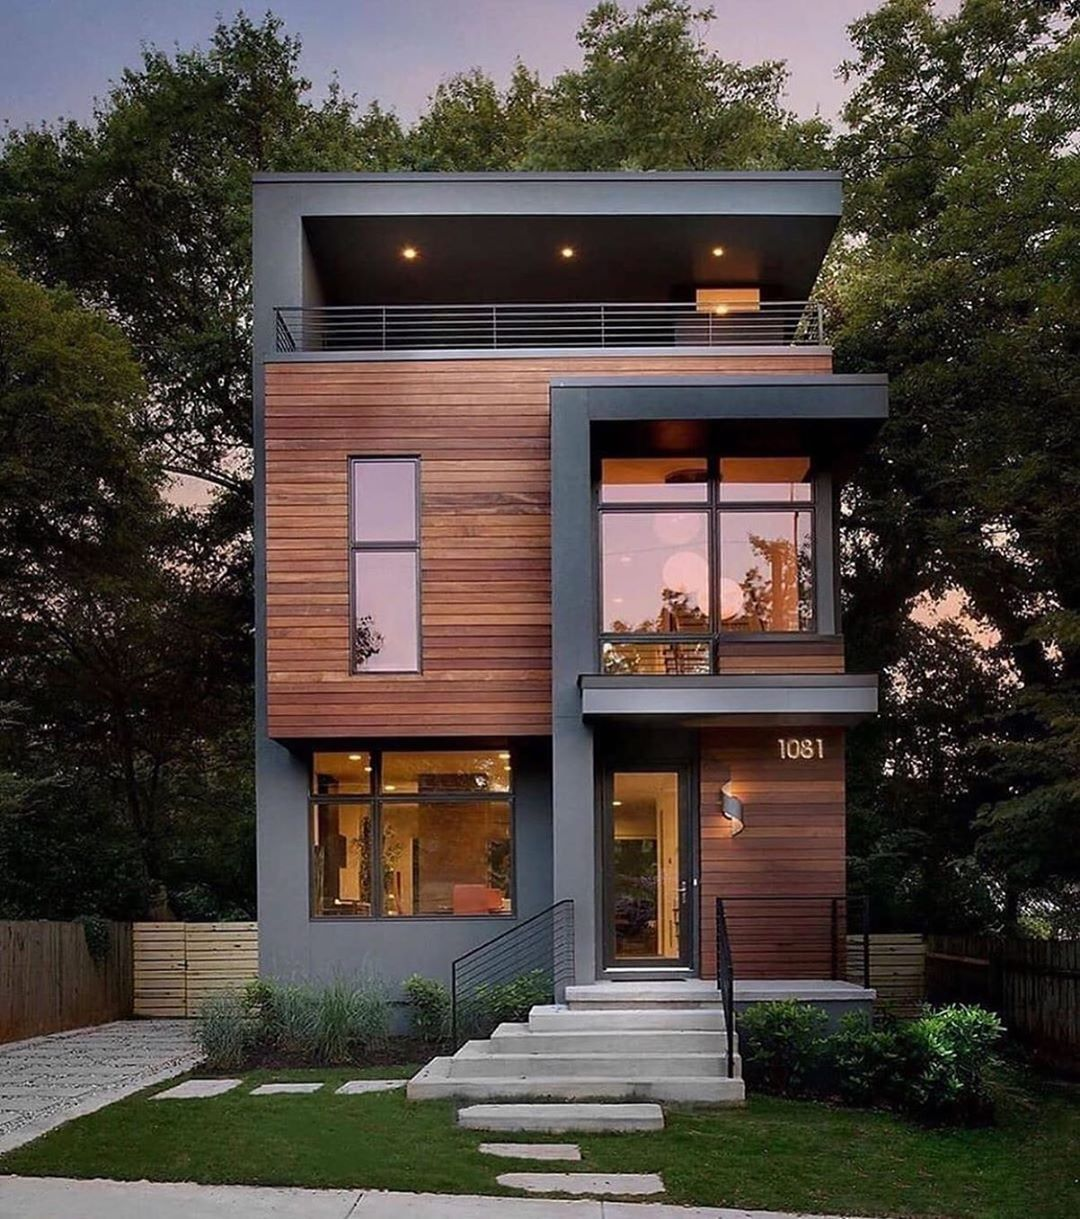 Contemporary Home Now On Instagram The Sanders Modern House Designed By Jordache K Atlanta Usa Small House Design House Architecture Design Facade House